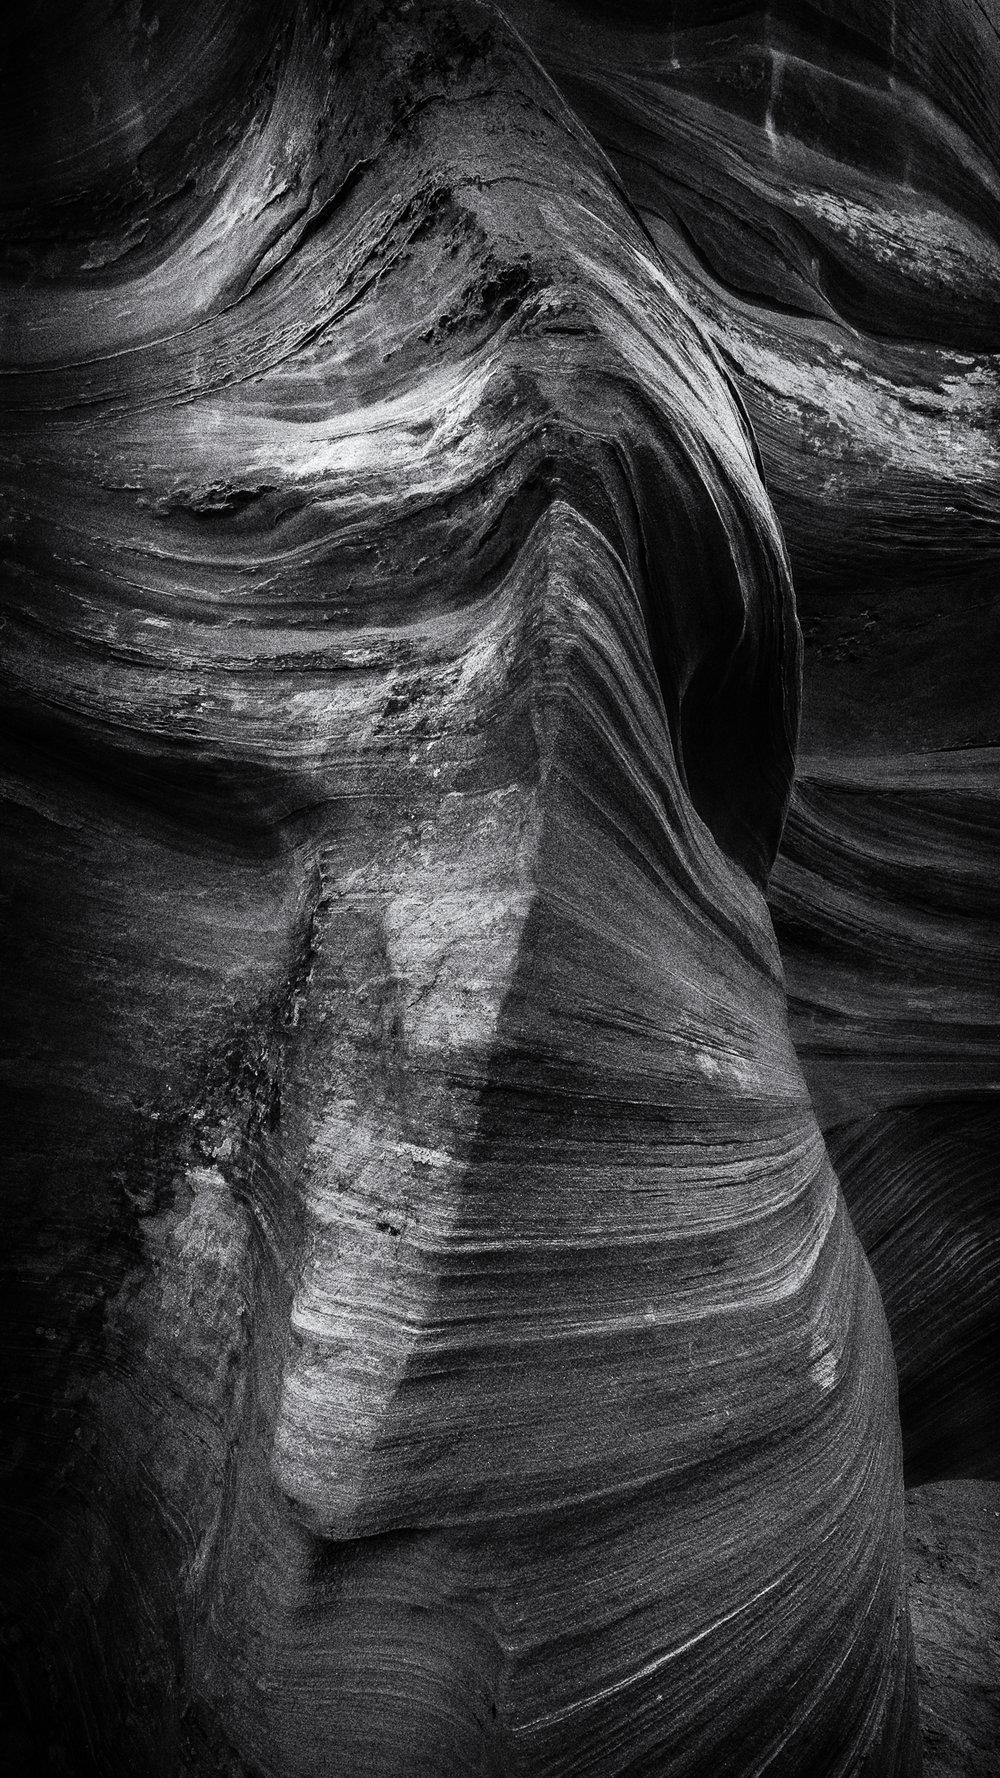 Yosemite-Slots-36.jpg